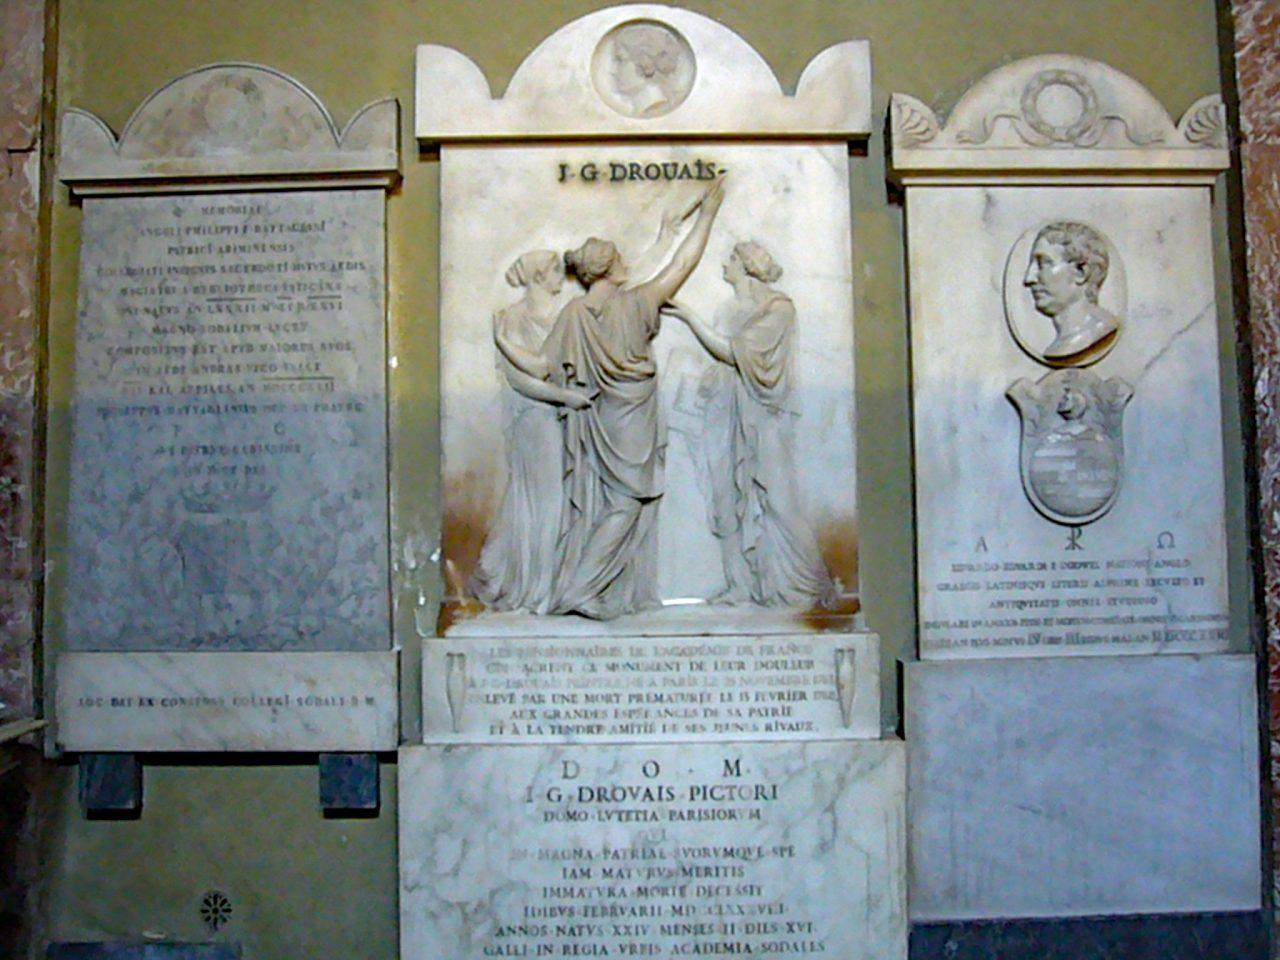 Roma, Chiesa di Santa Maria in Via Lata, Schip re, Mon Drouais (internet)